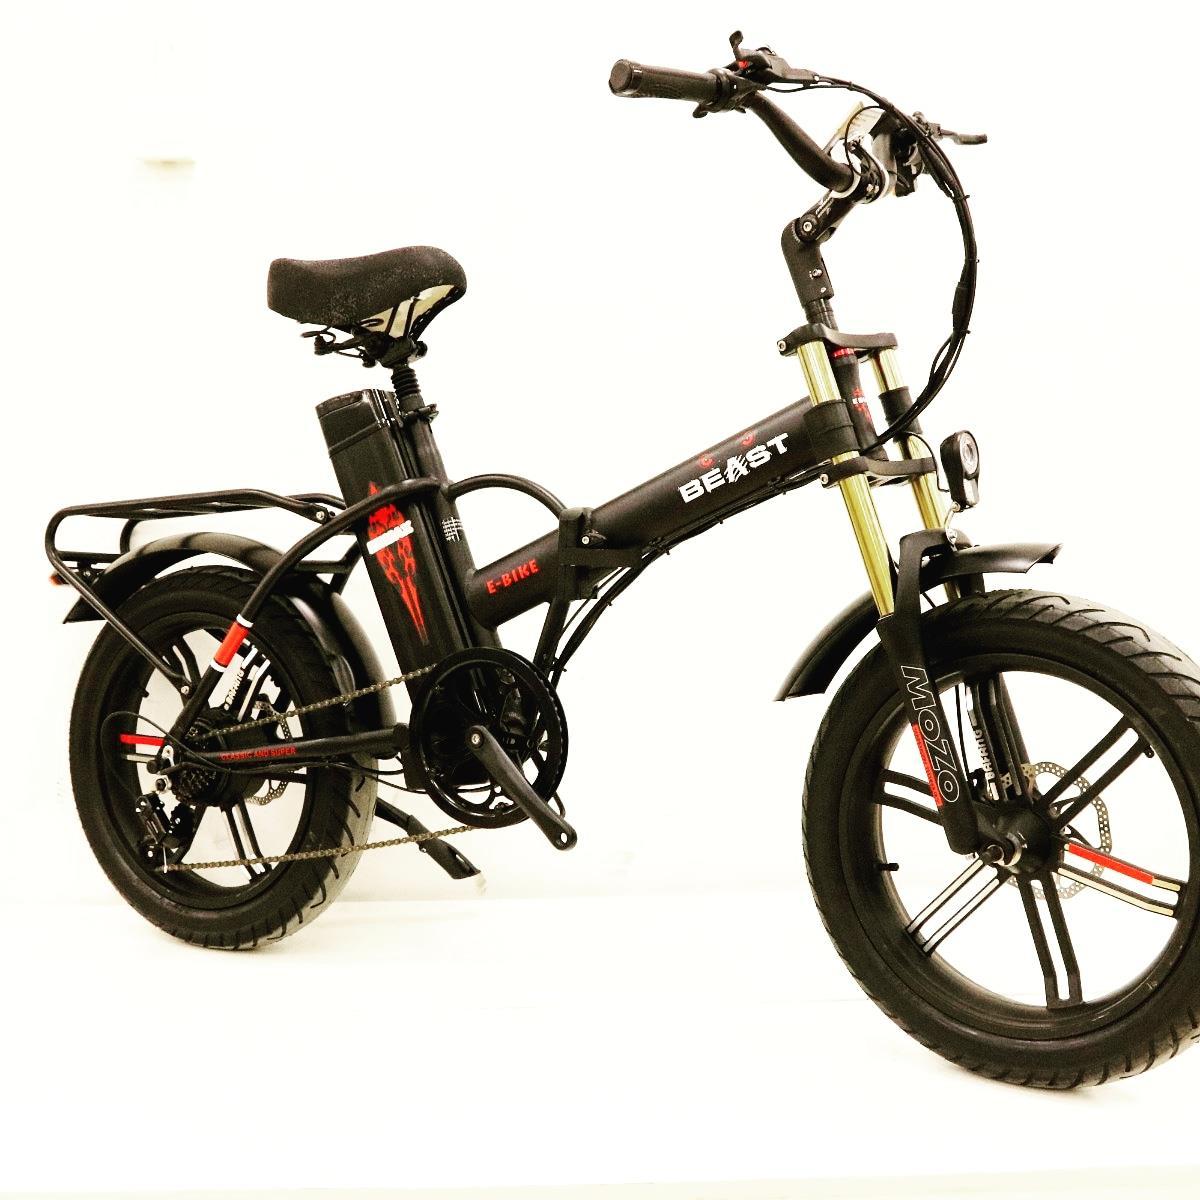 BEAST אופניים חשמליים